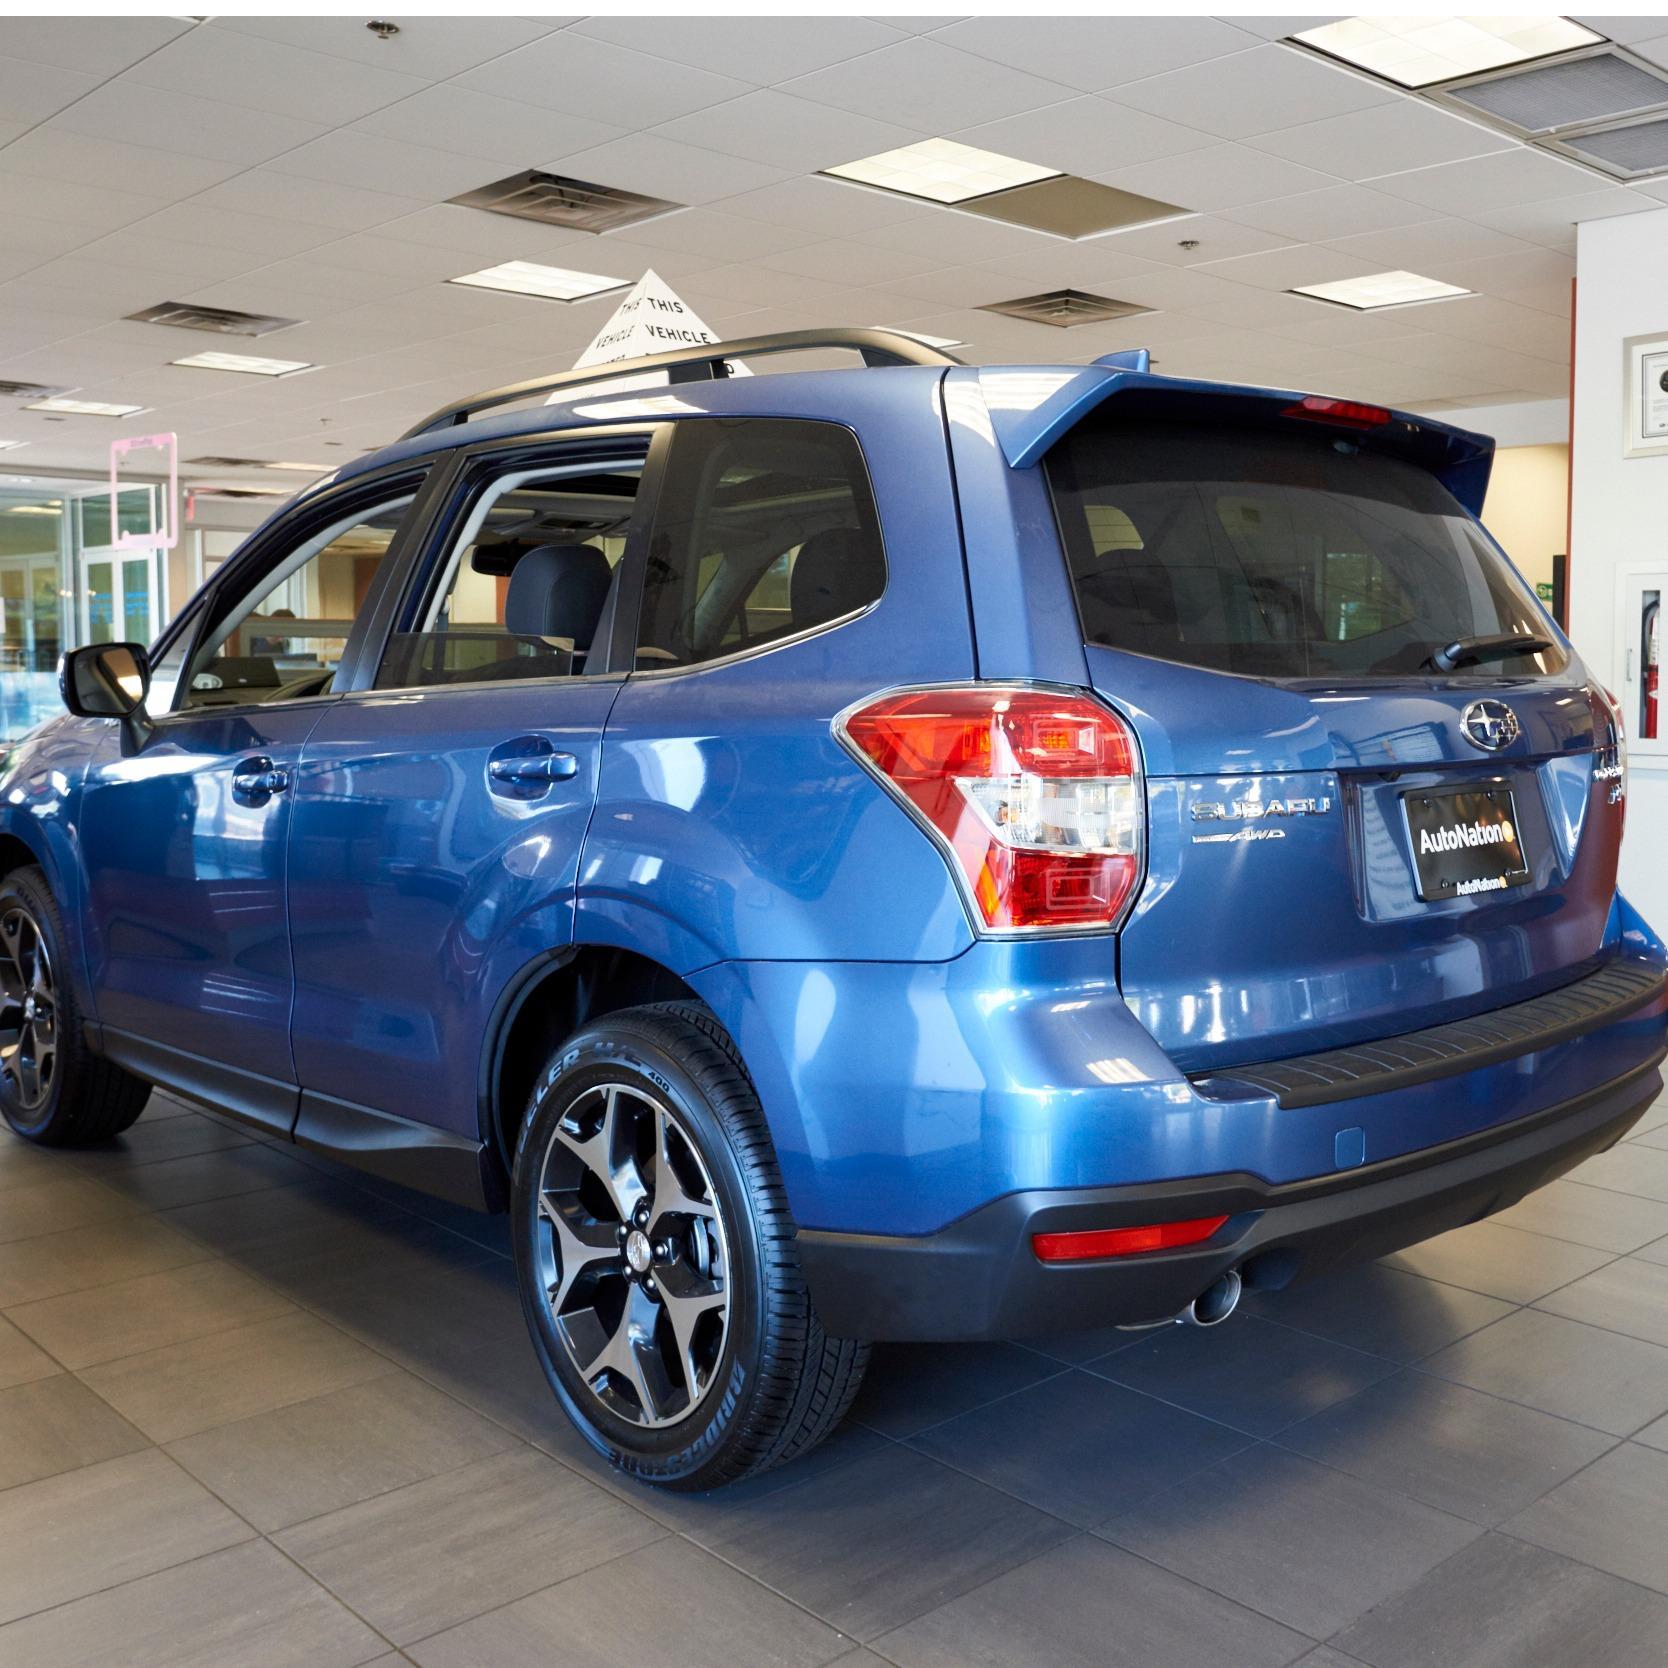 Autonation subaru scottsdale scottsdale arizona az for Subaru motors finance online payment